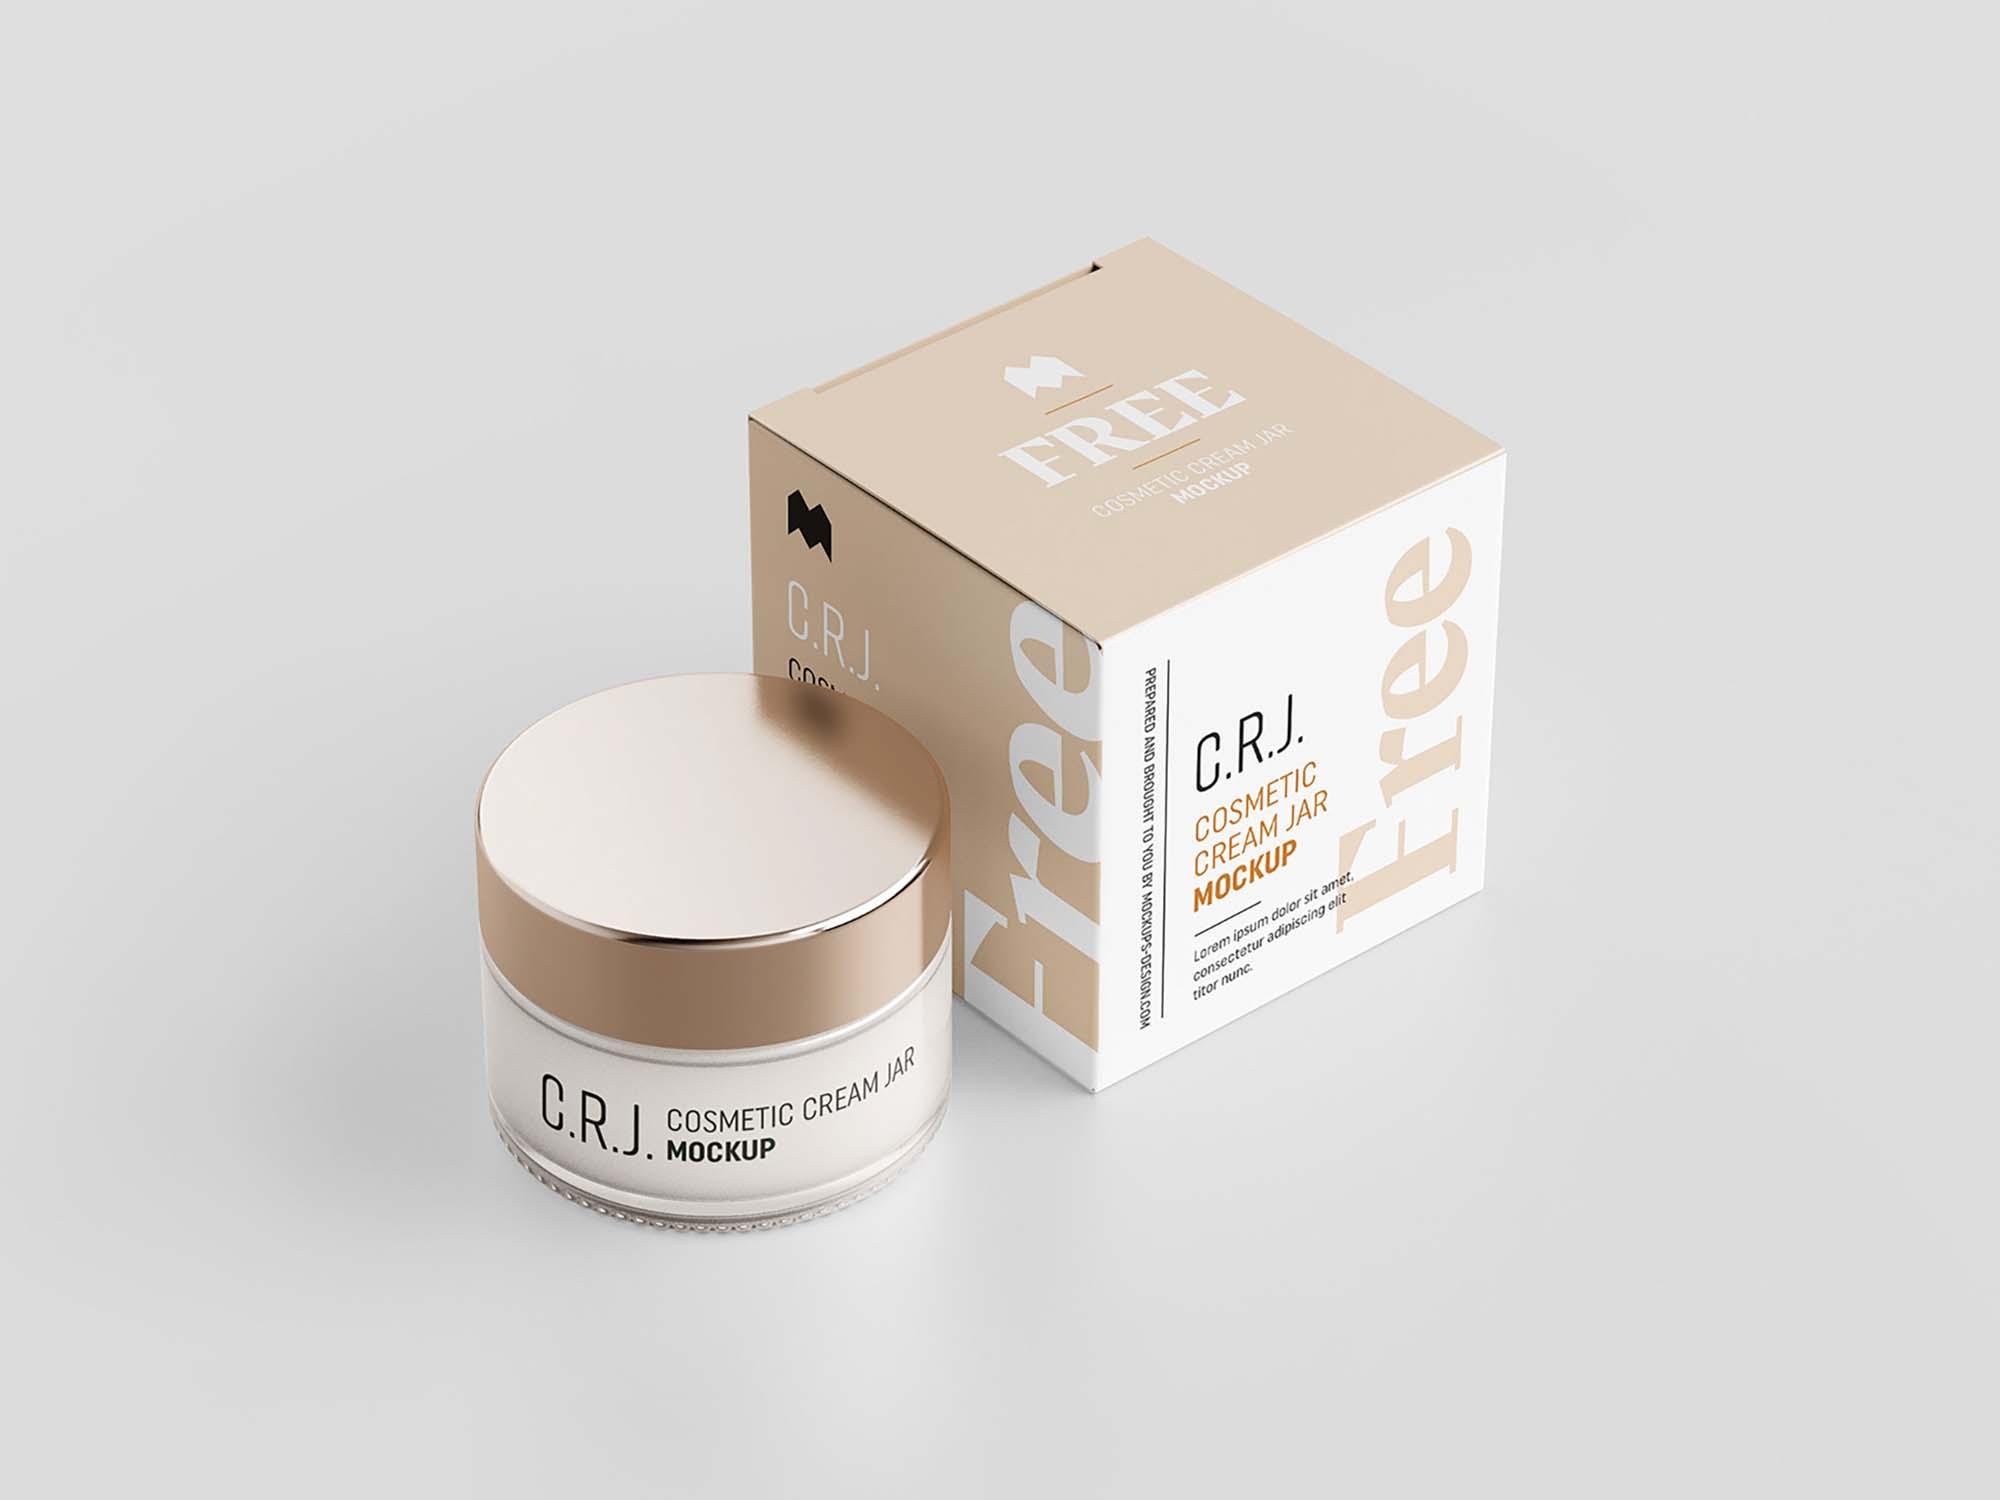 Cosmetic Box with Jar Mockup 1